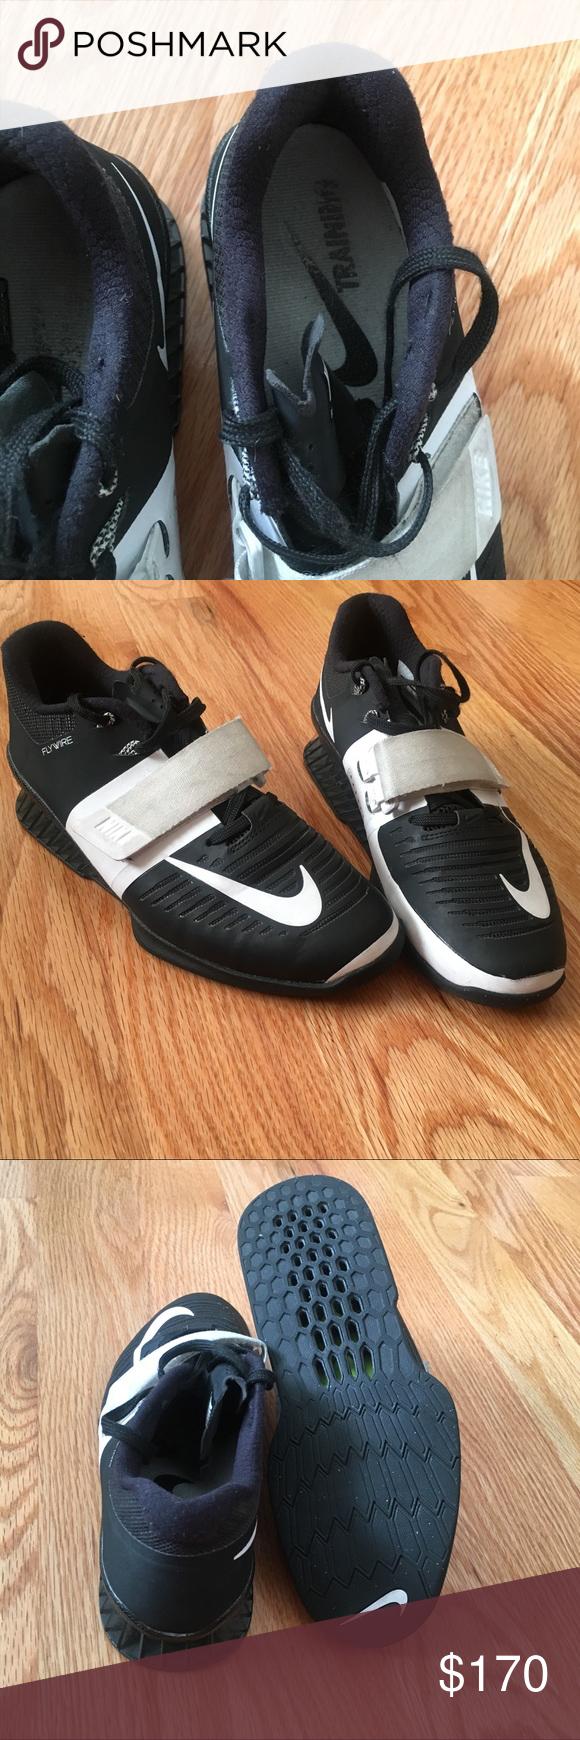 Like new Nike Romaleos 3 size 7.5 Like new women s Nike Romaleos 3. They re  size 7.5s 36776eb77